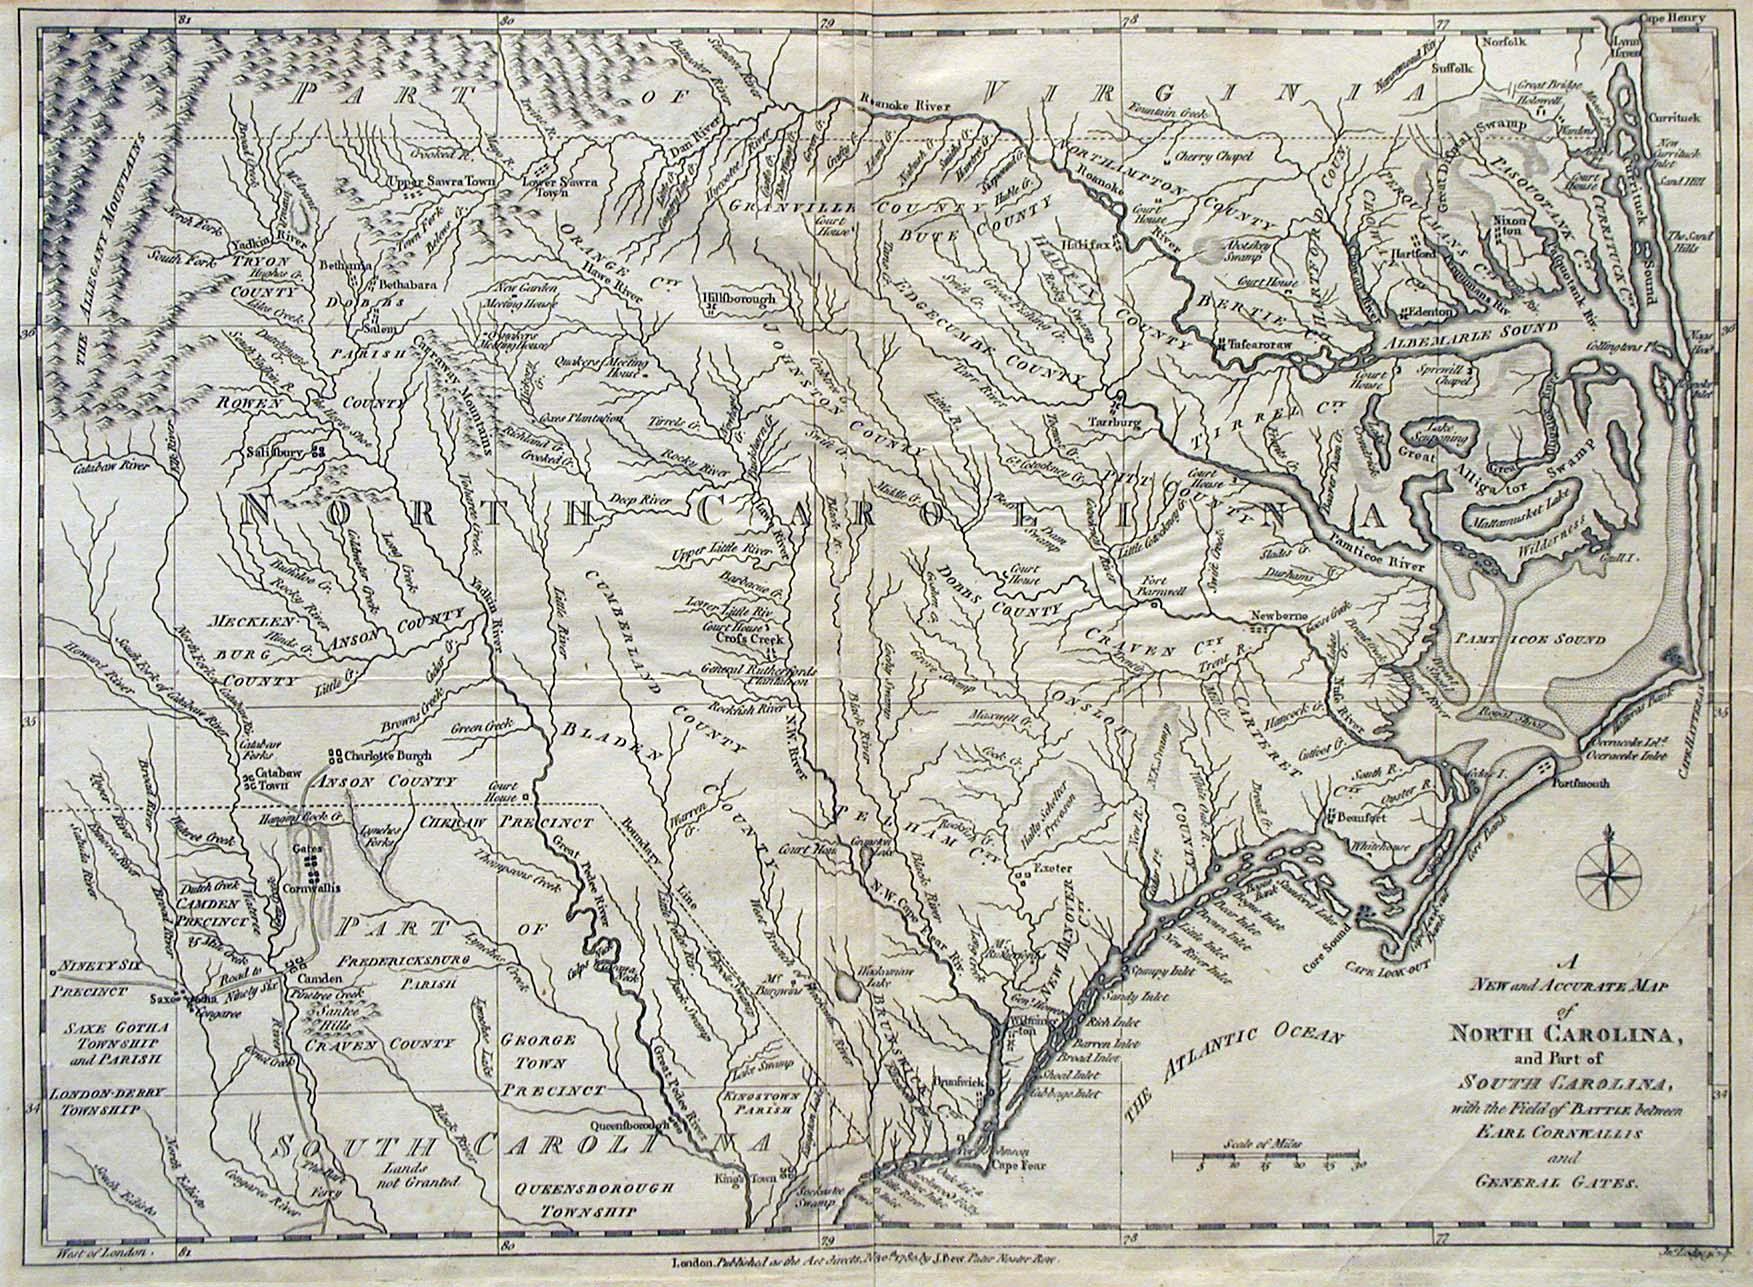 US GebWeb Digital Map Library - North Carolina